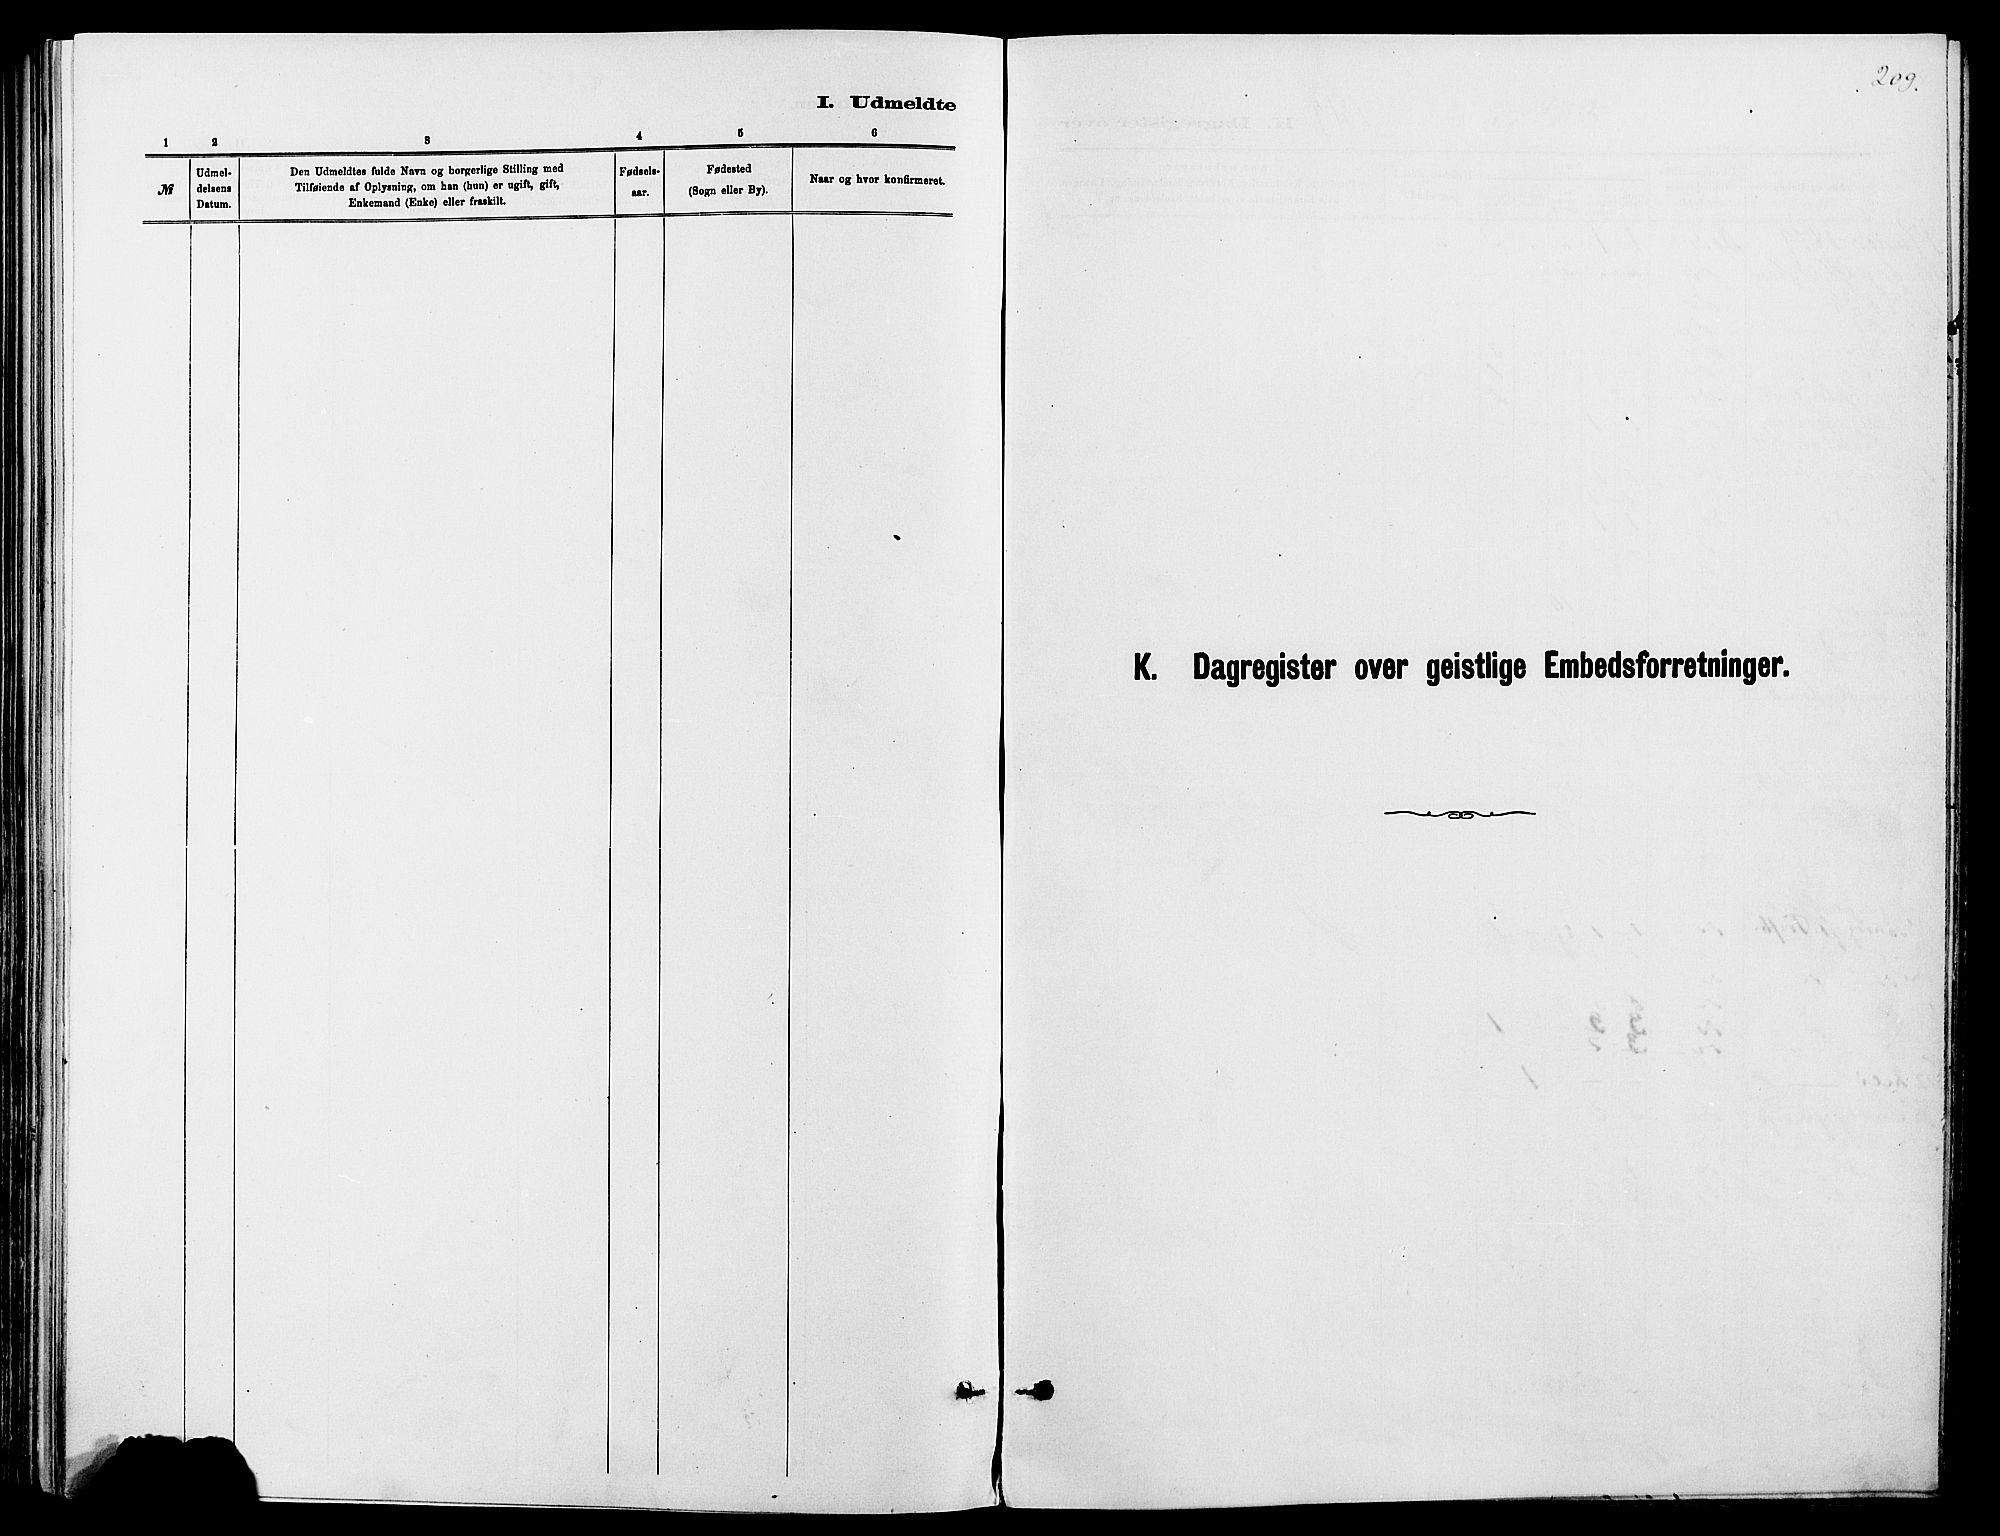 SAH, Dovre prestekontor, Ministerialbok nr. 2, 1879-1890, s. 209